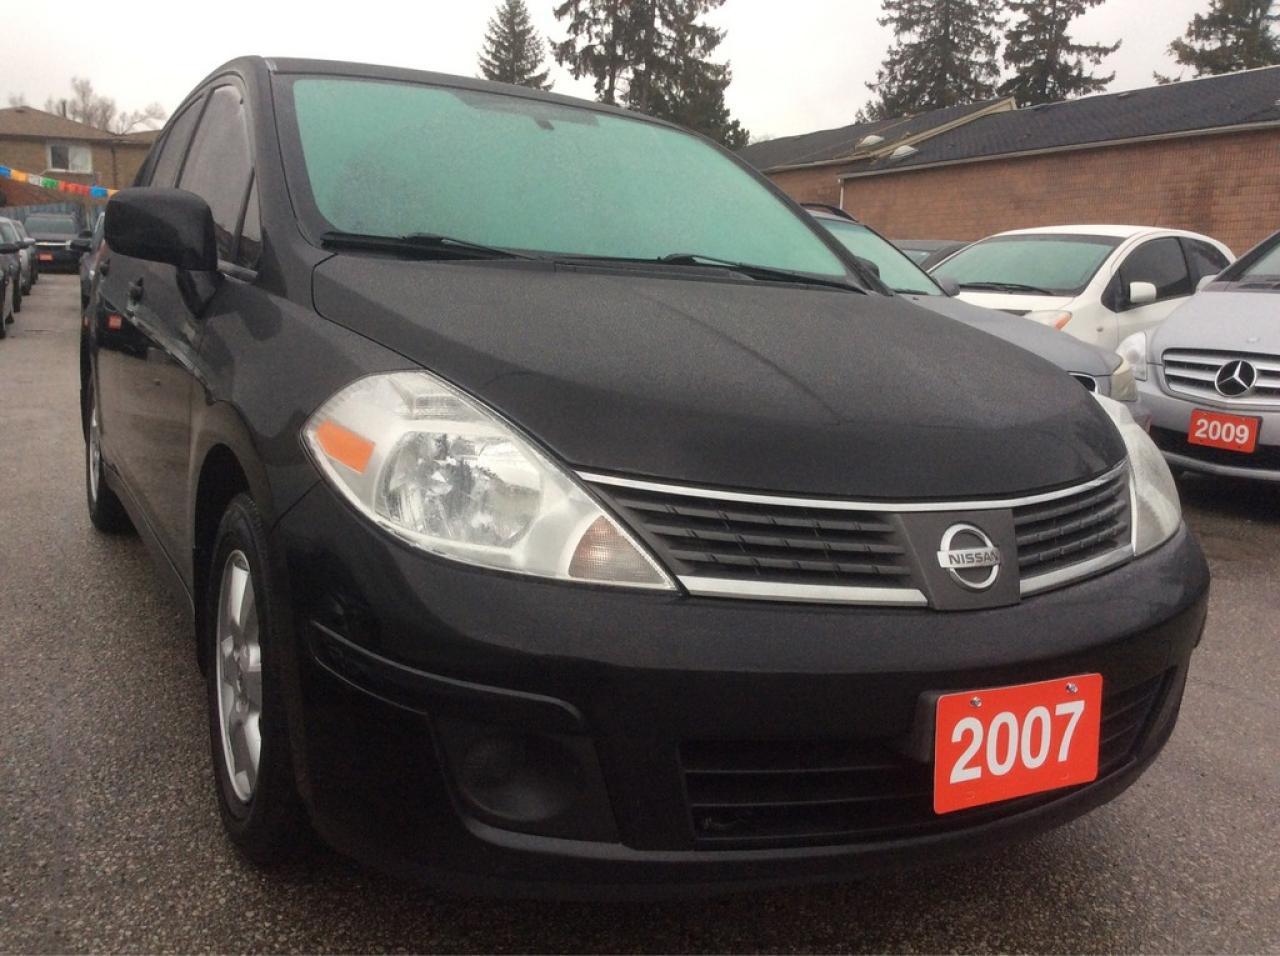 2007 Nissan Versa 1.8 SL Bluetooth AUX Alloys $$GAS SAVER$$